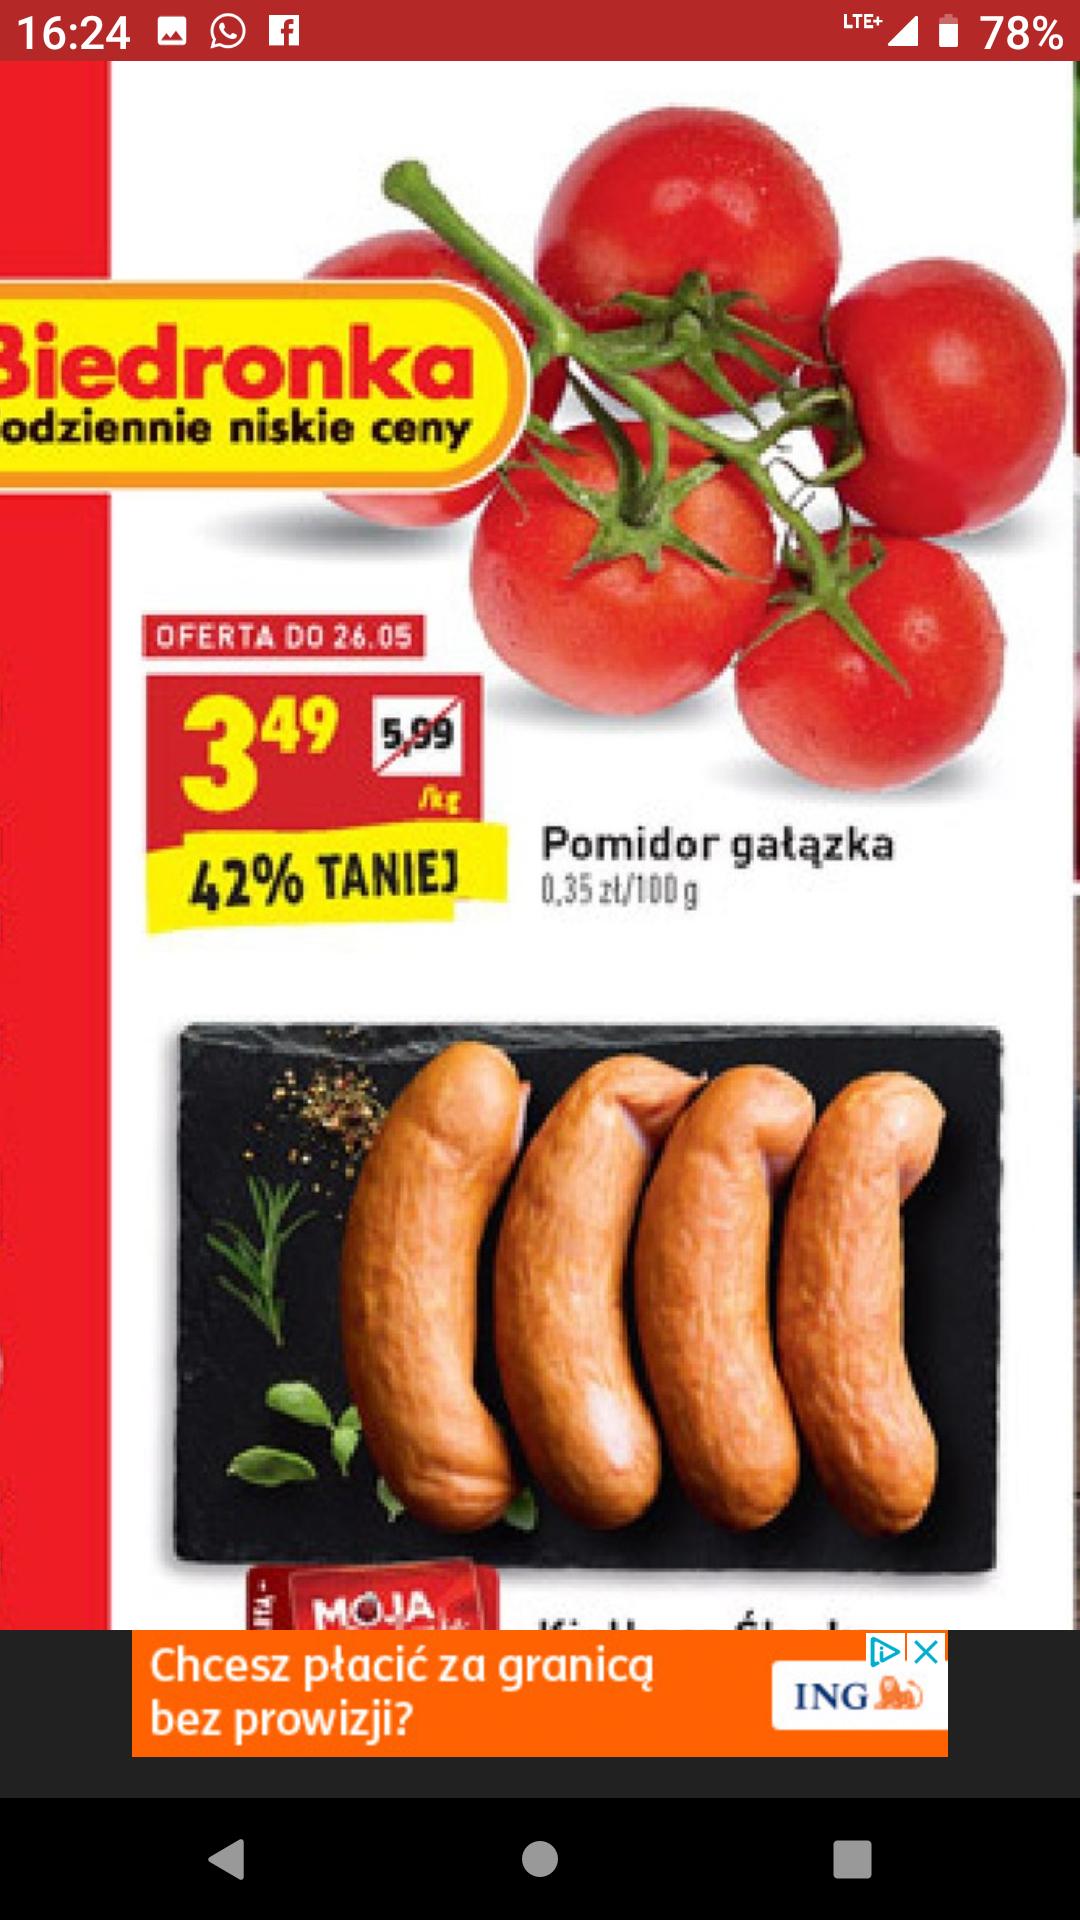 Pomidor gałązka pomidory @ Biedronka